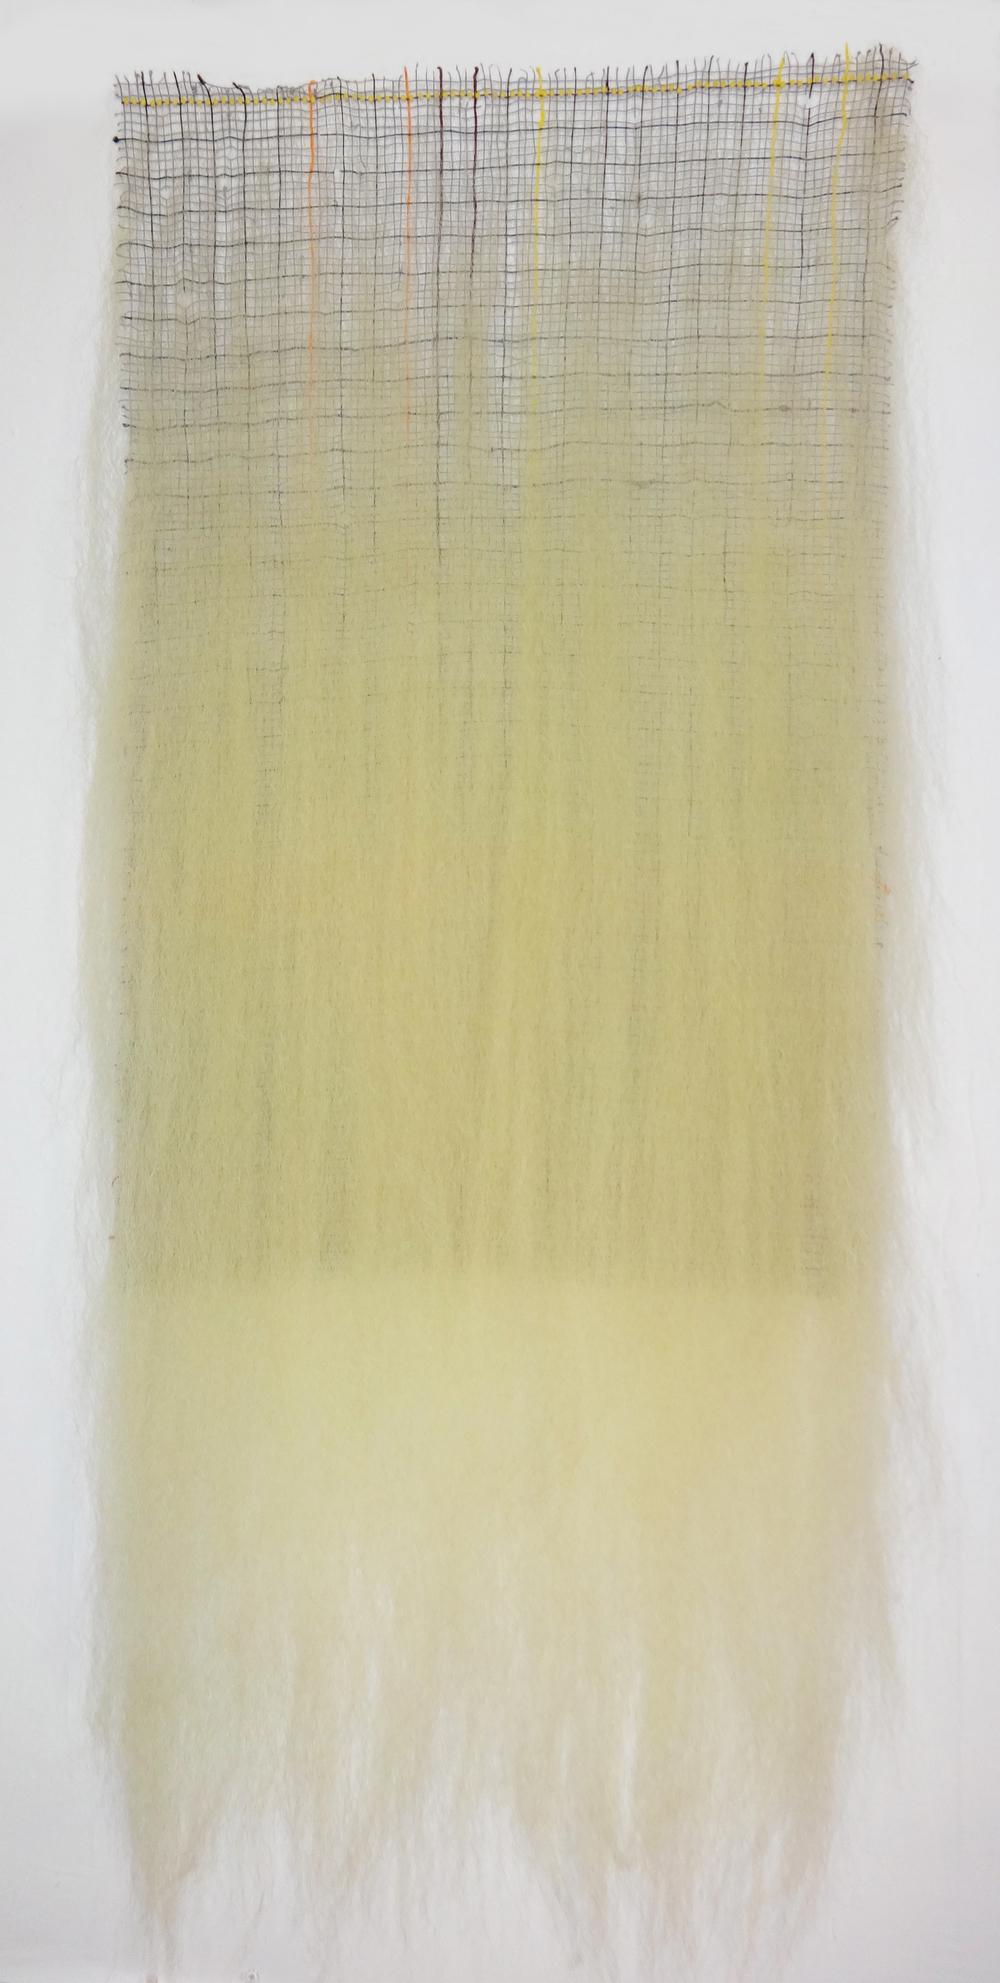 Frizz (Mist Gallery).jpg